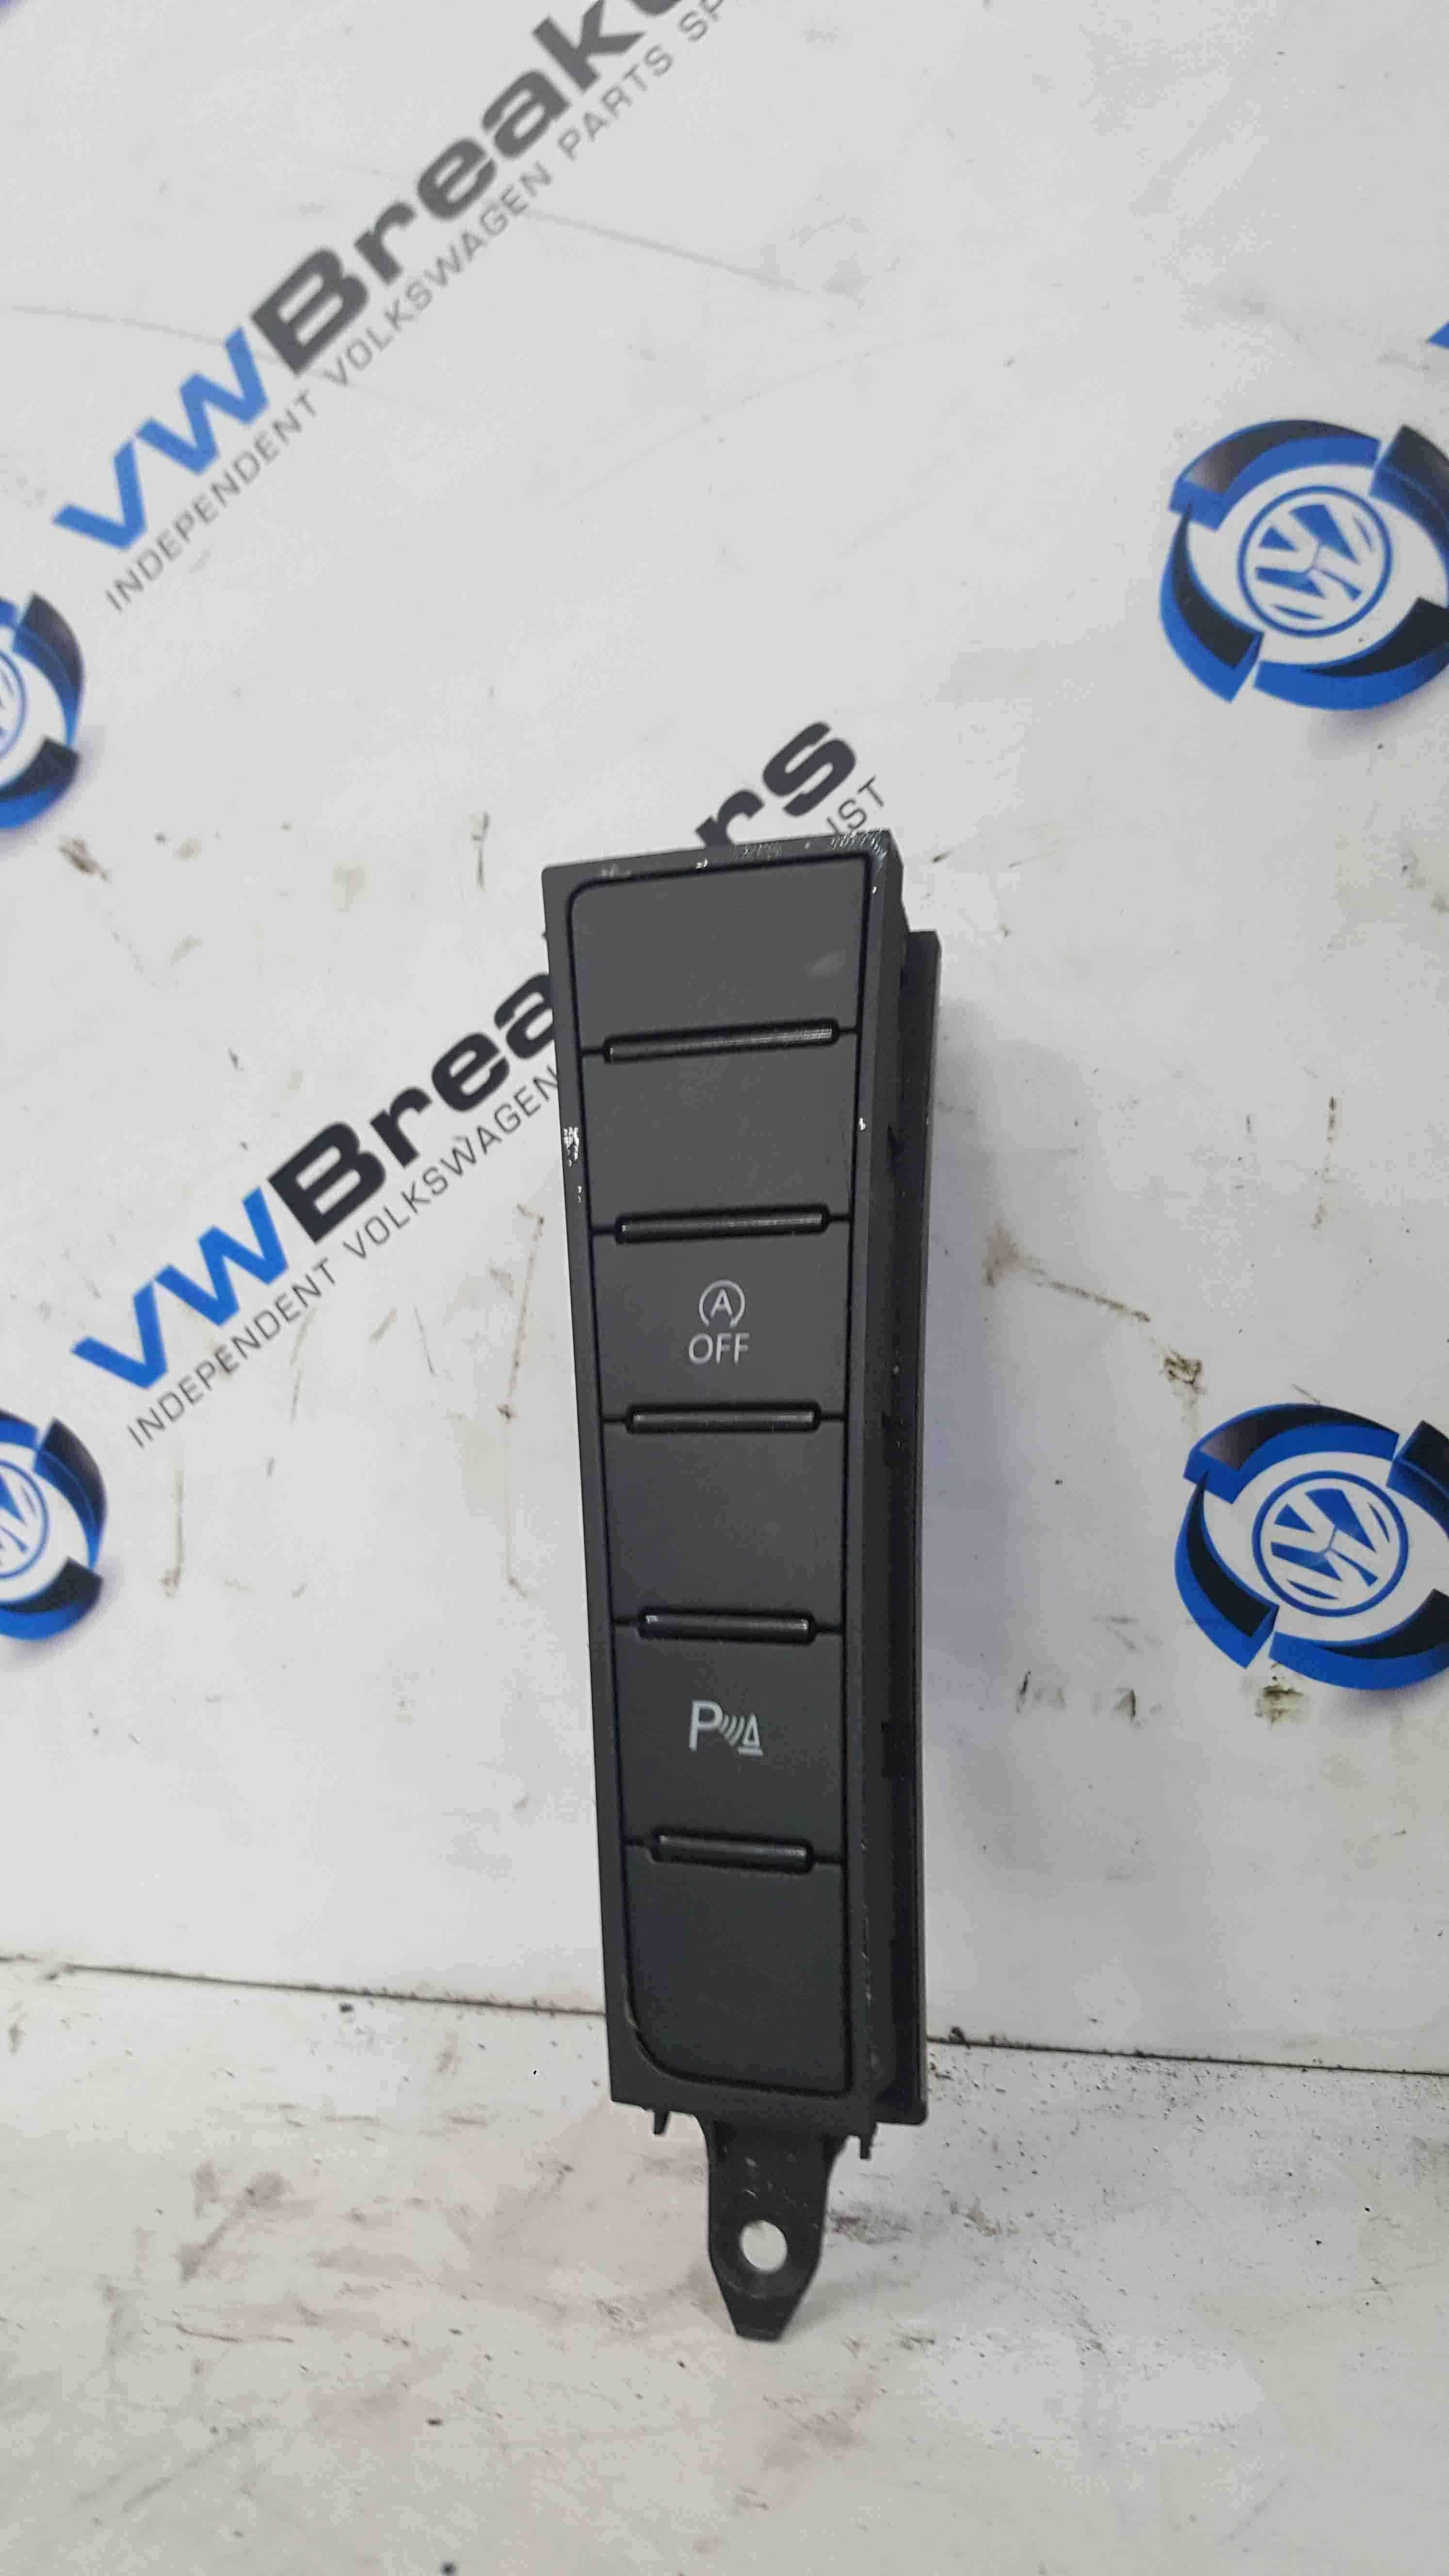 Volkswagen Passat B7 2010-2015 A Off Parking Sensor Alarm Switches Panel